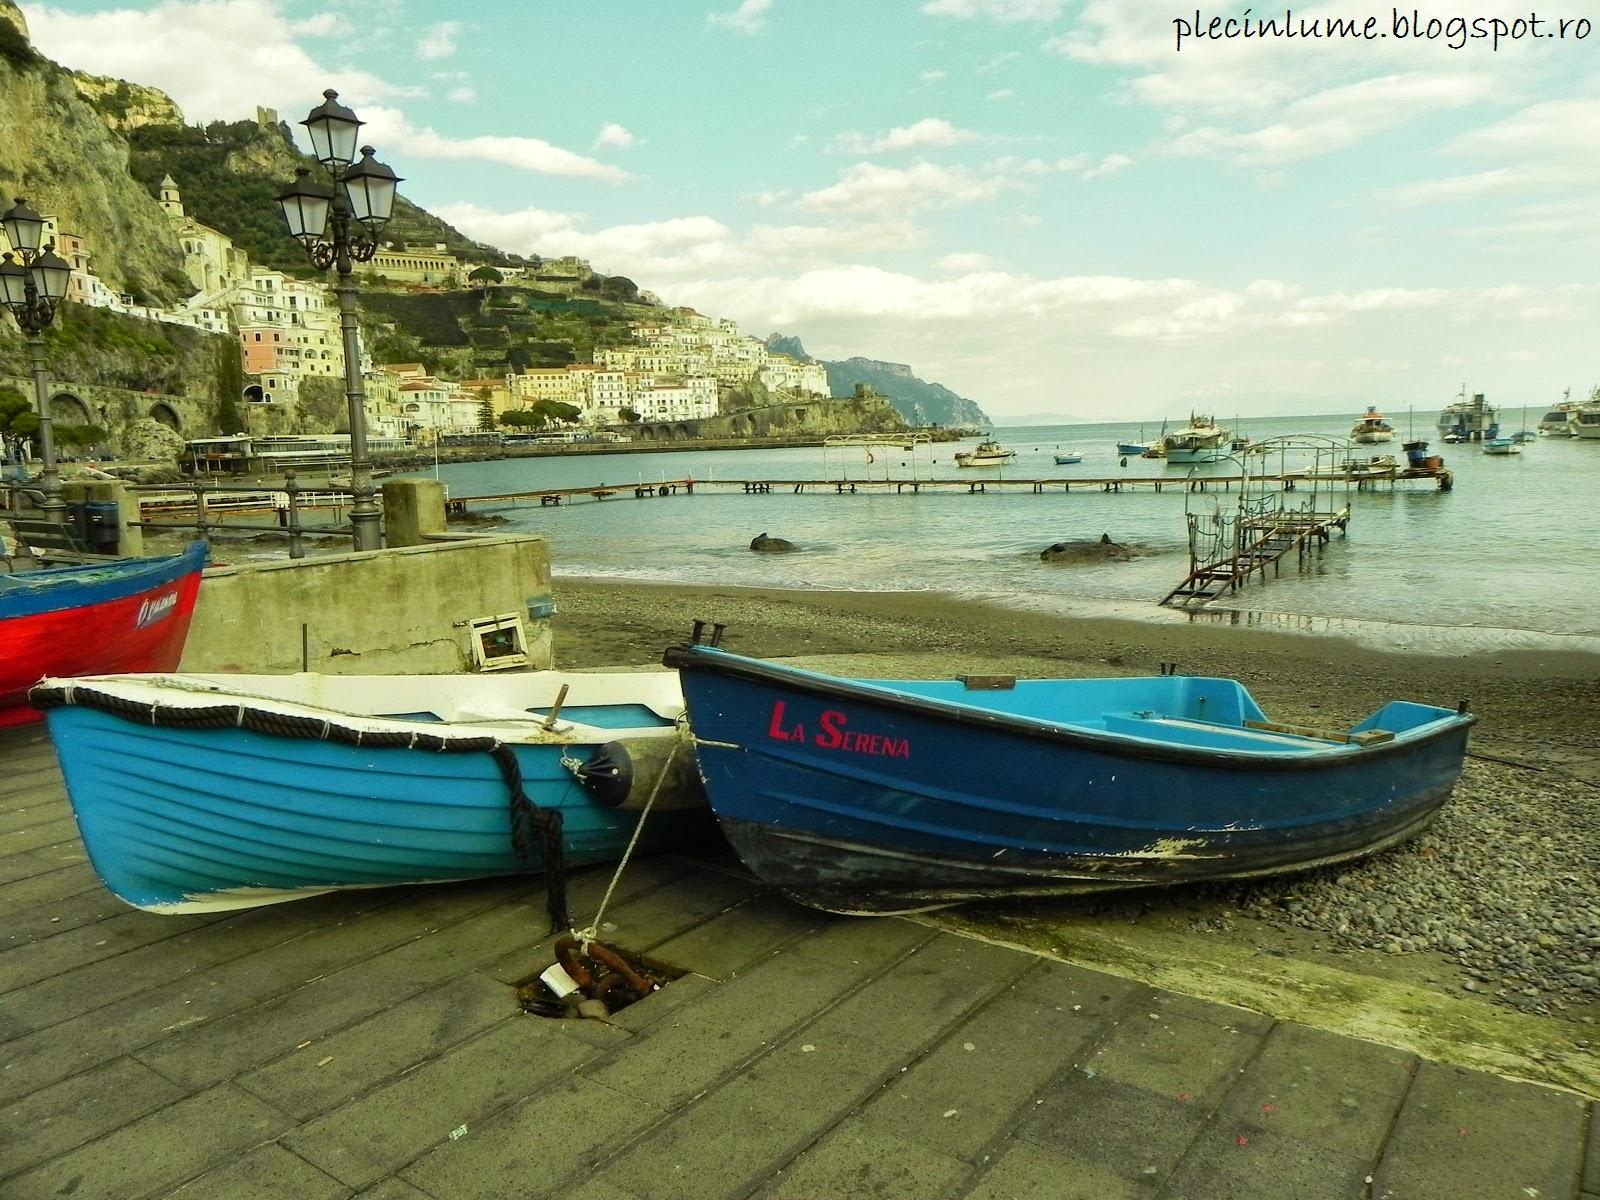 Priveliste din Amalfi